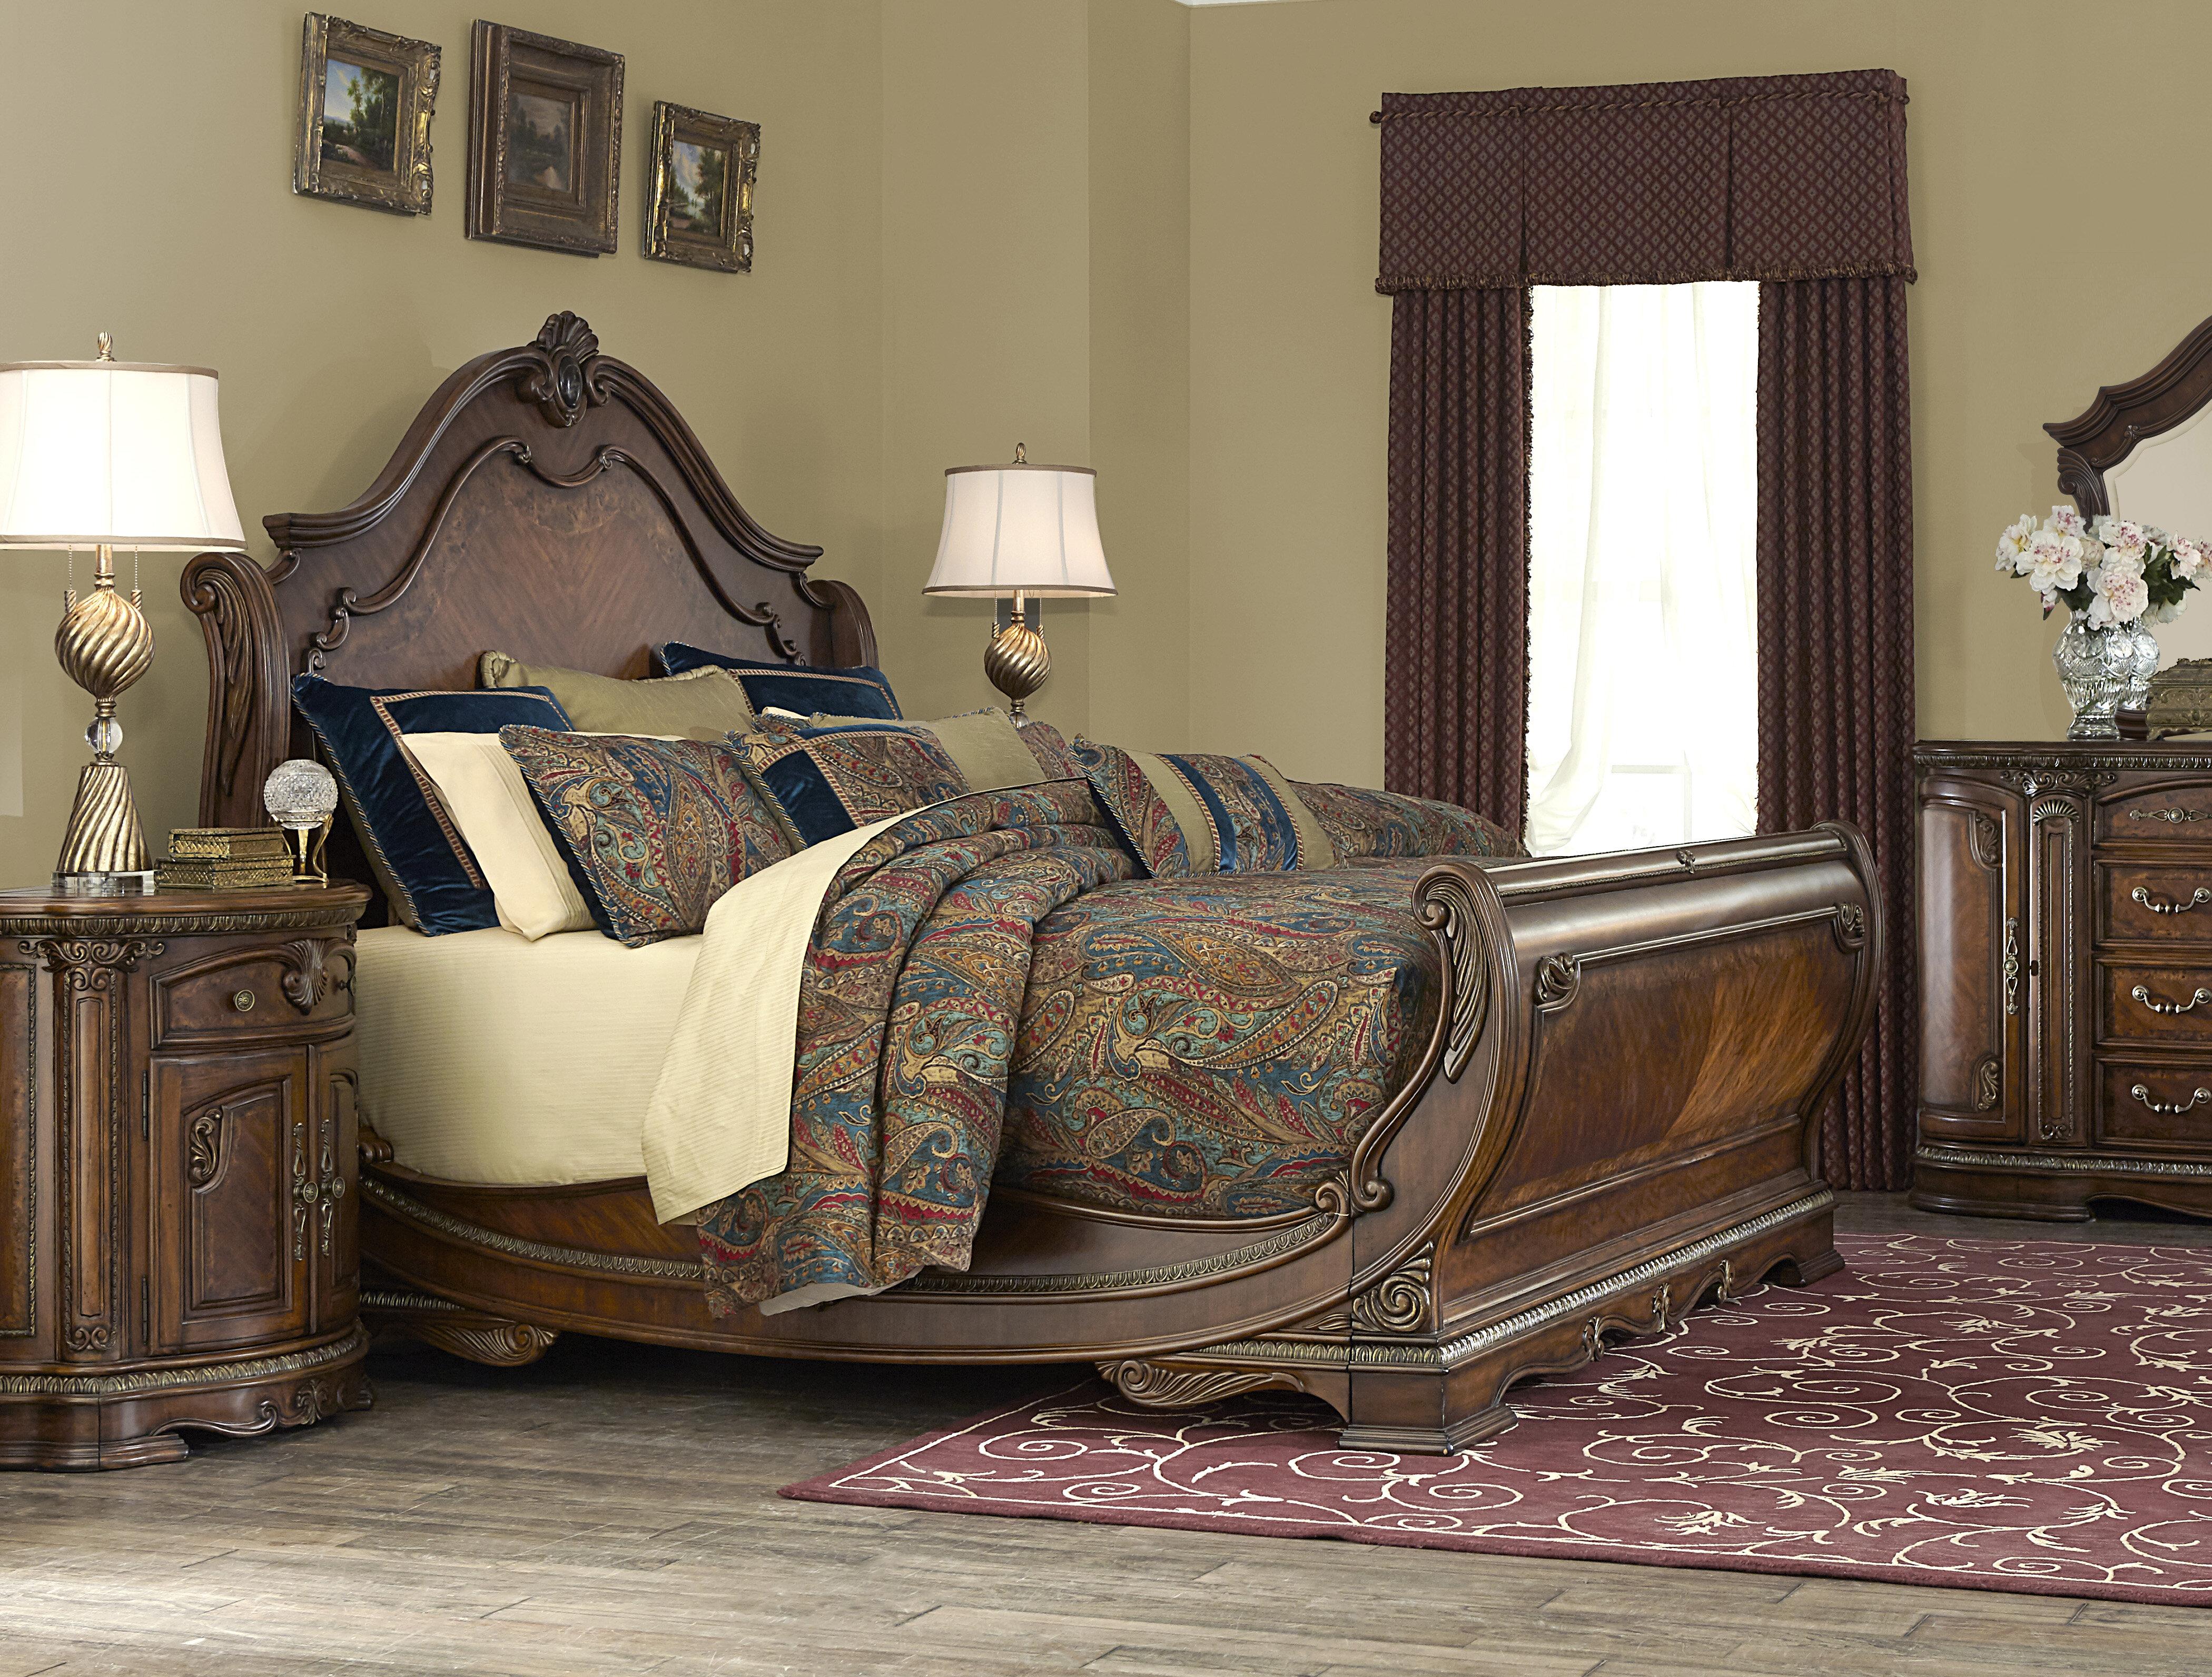 Delicieux Michael Amini Bella Veneto Sleigh Bed U0026 Reviews | Wayfair